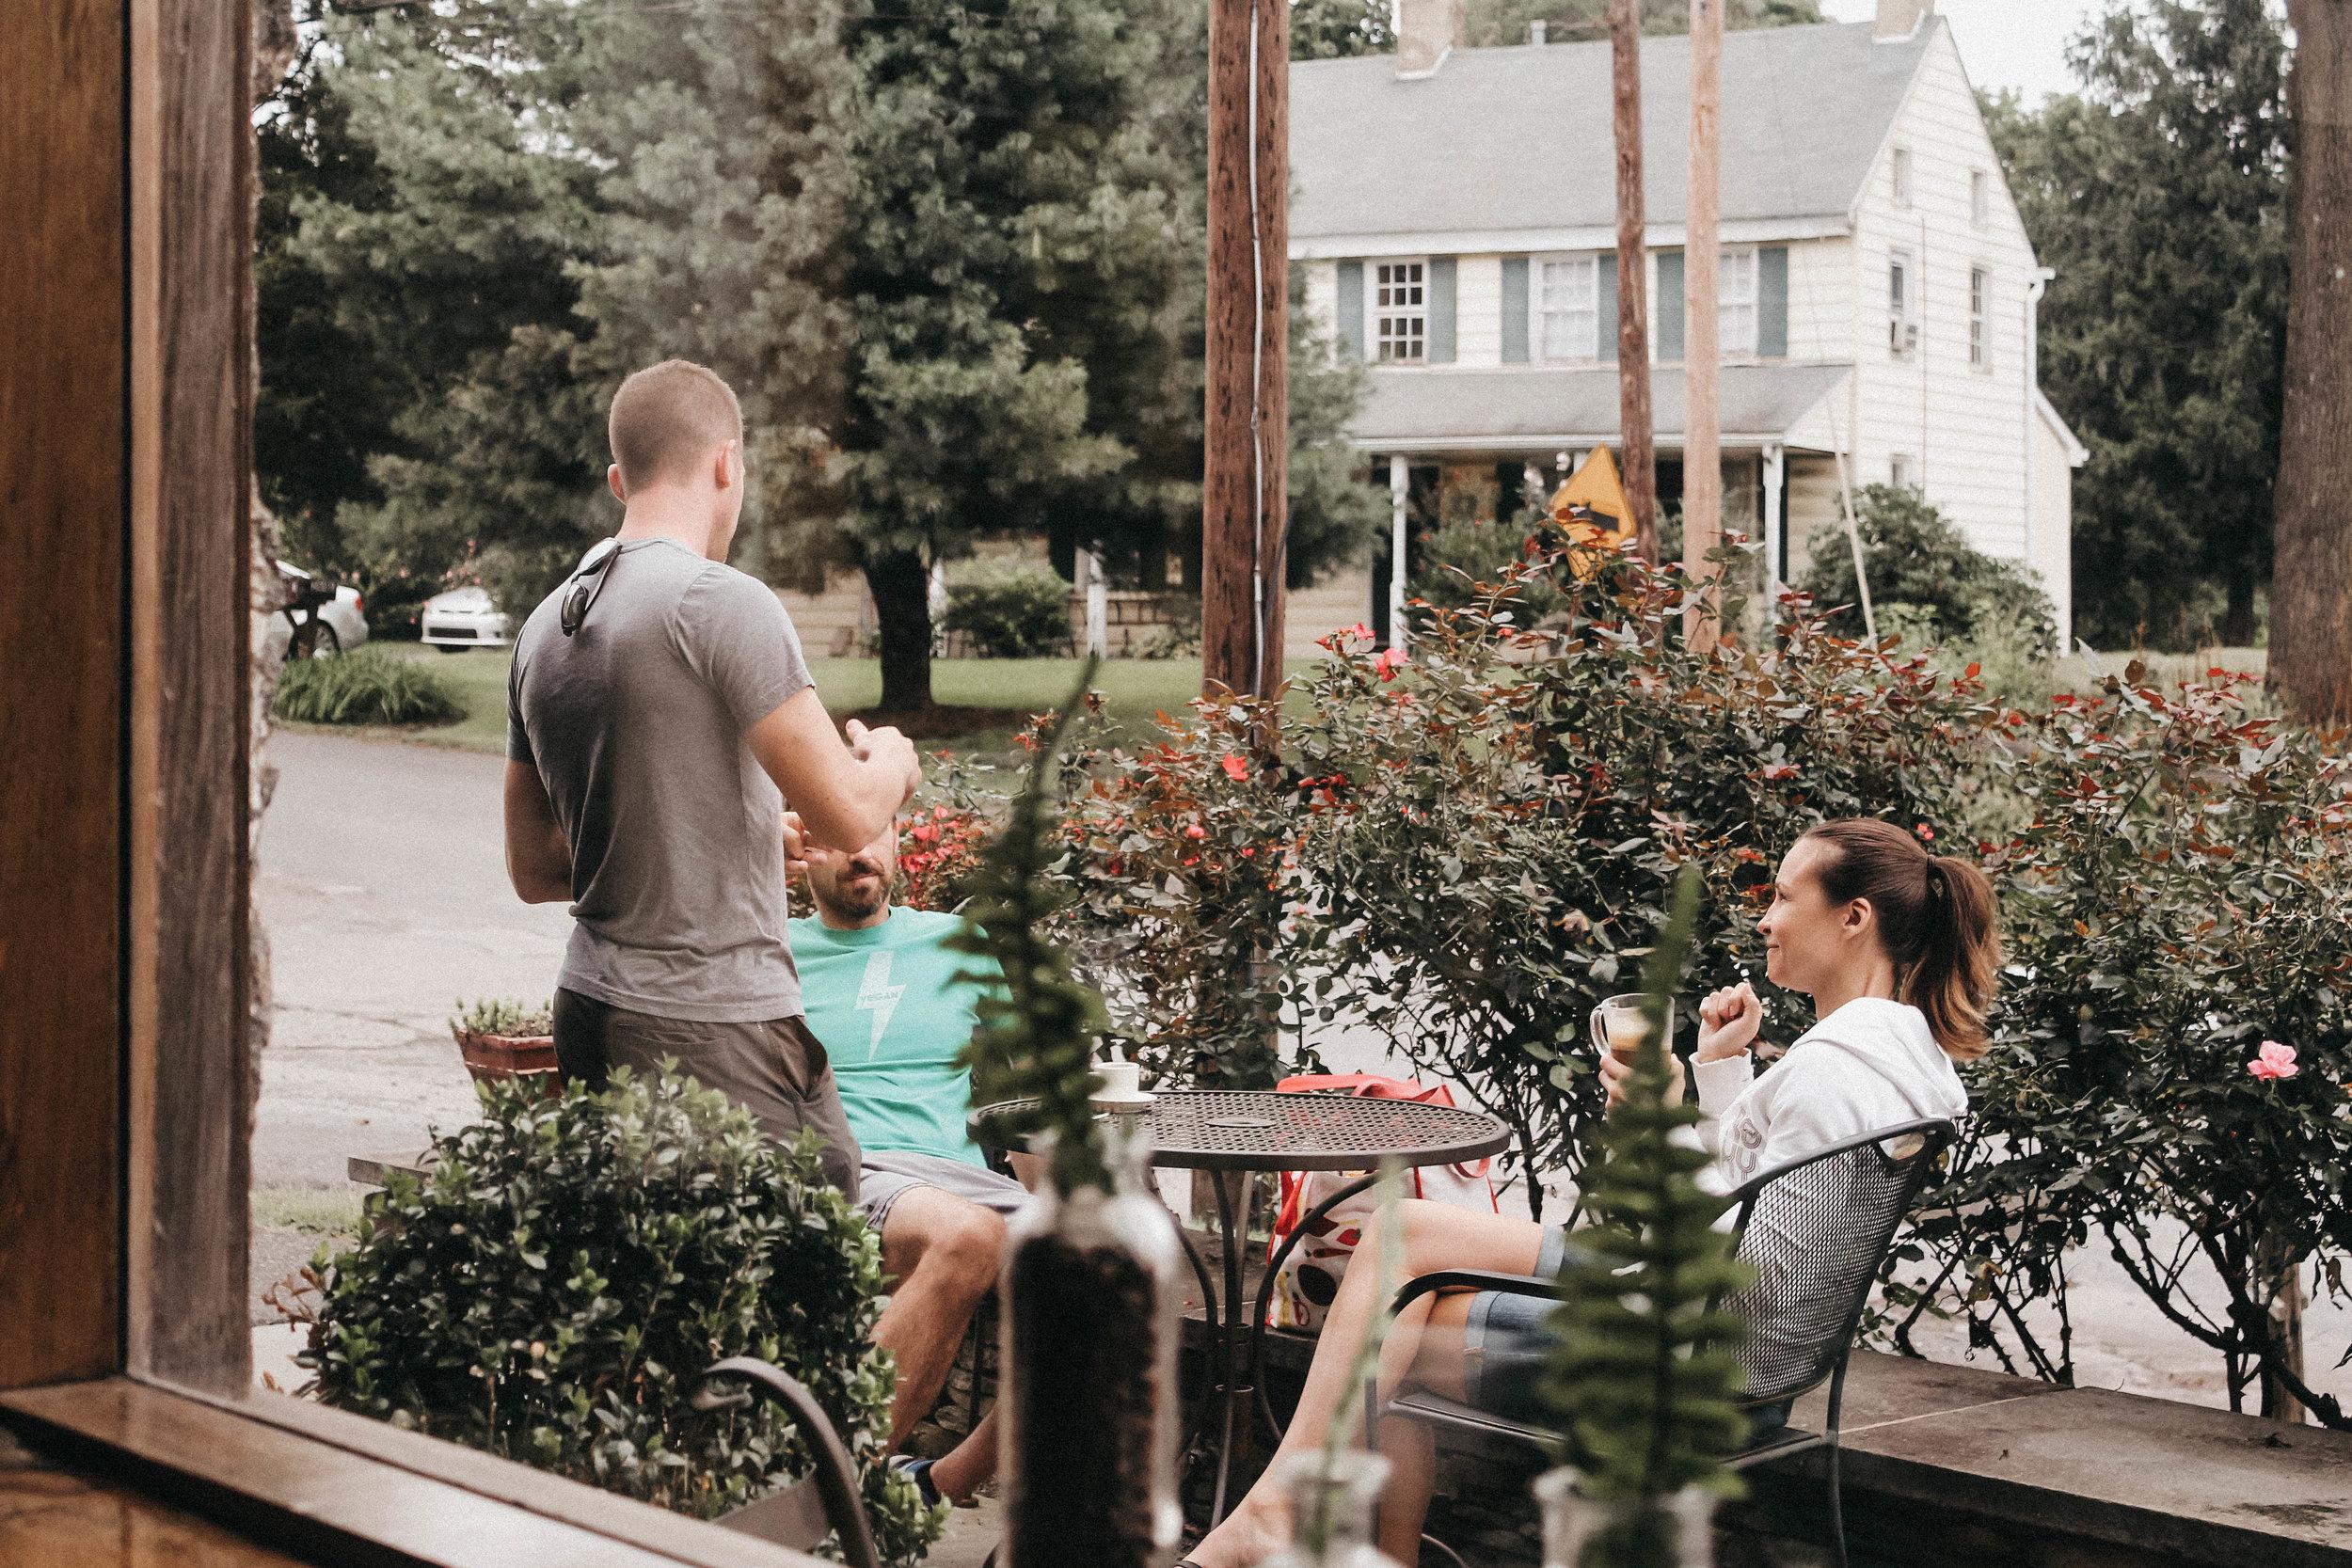 brigodoon coffee house people talking.jpg